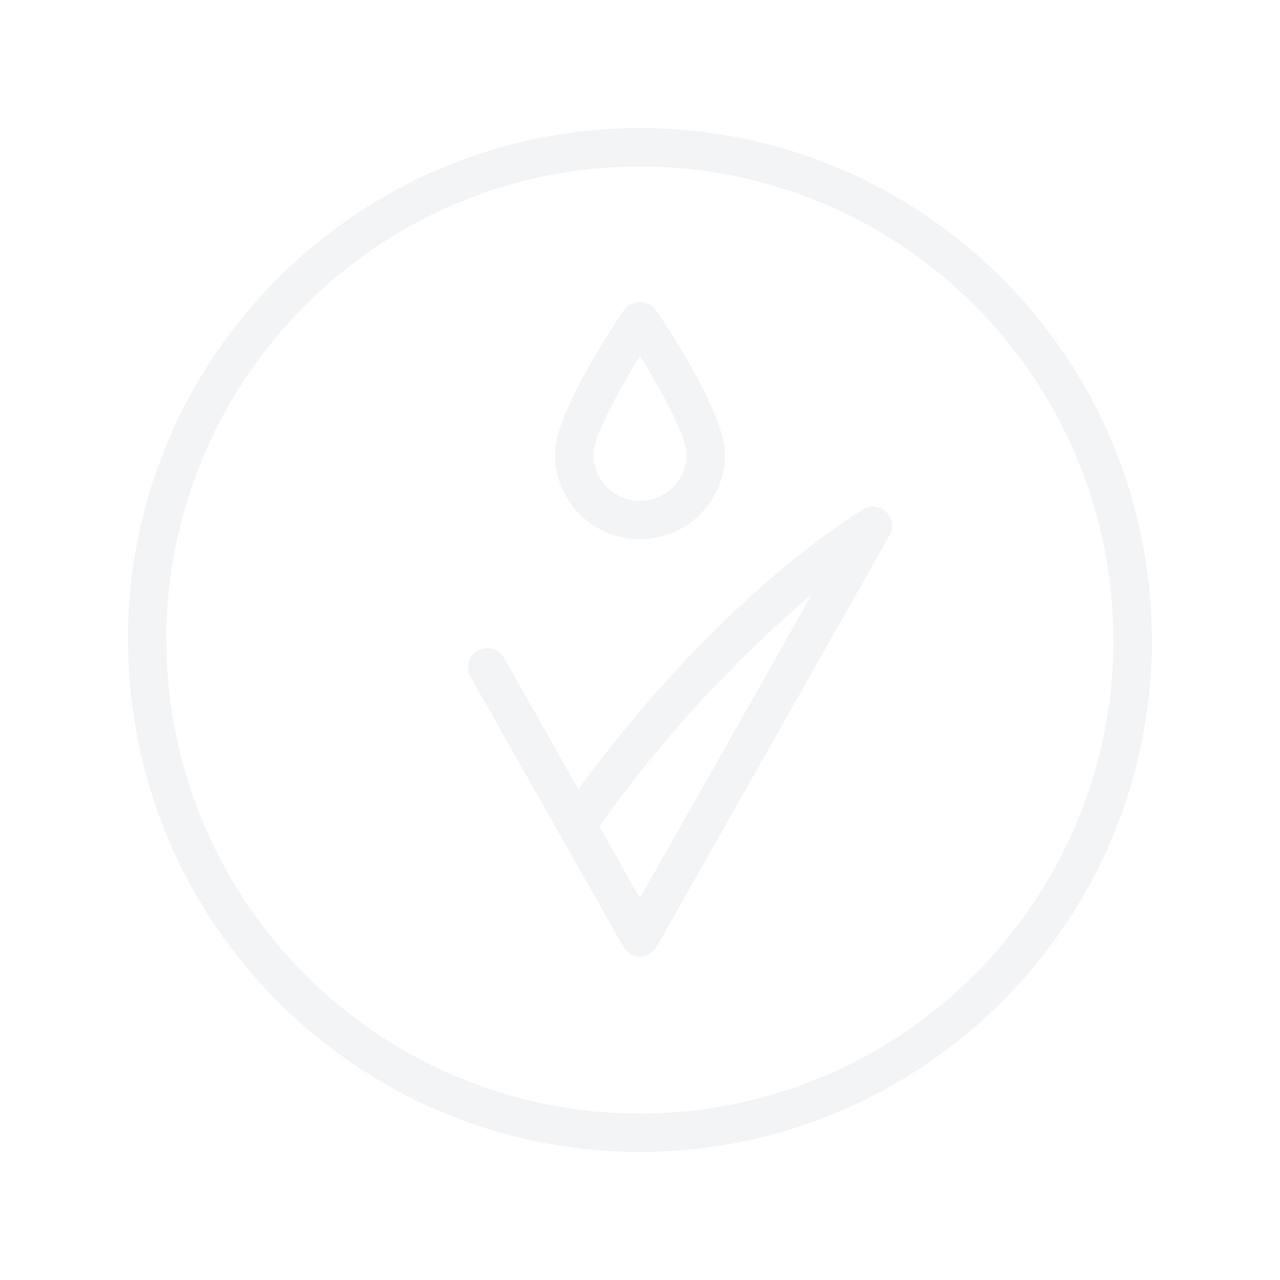 LA ROCHE-POSAY Cicaplast Lip Repairing Balm 7.5ml